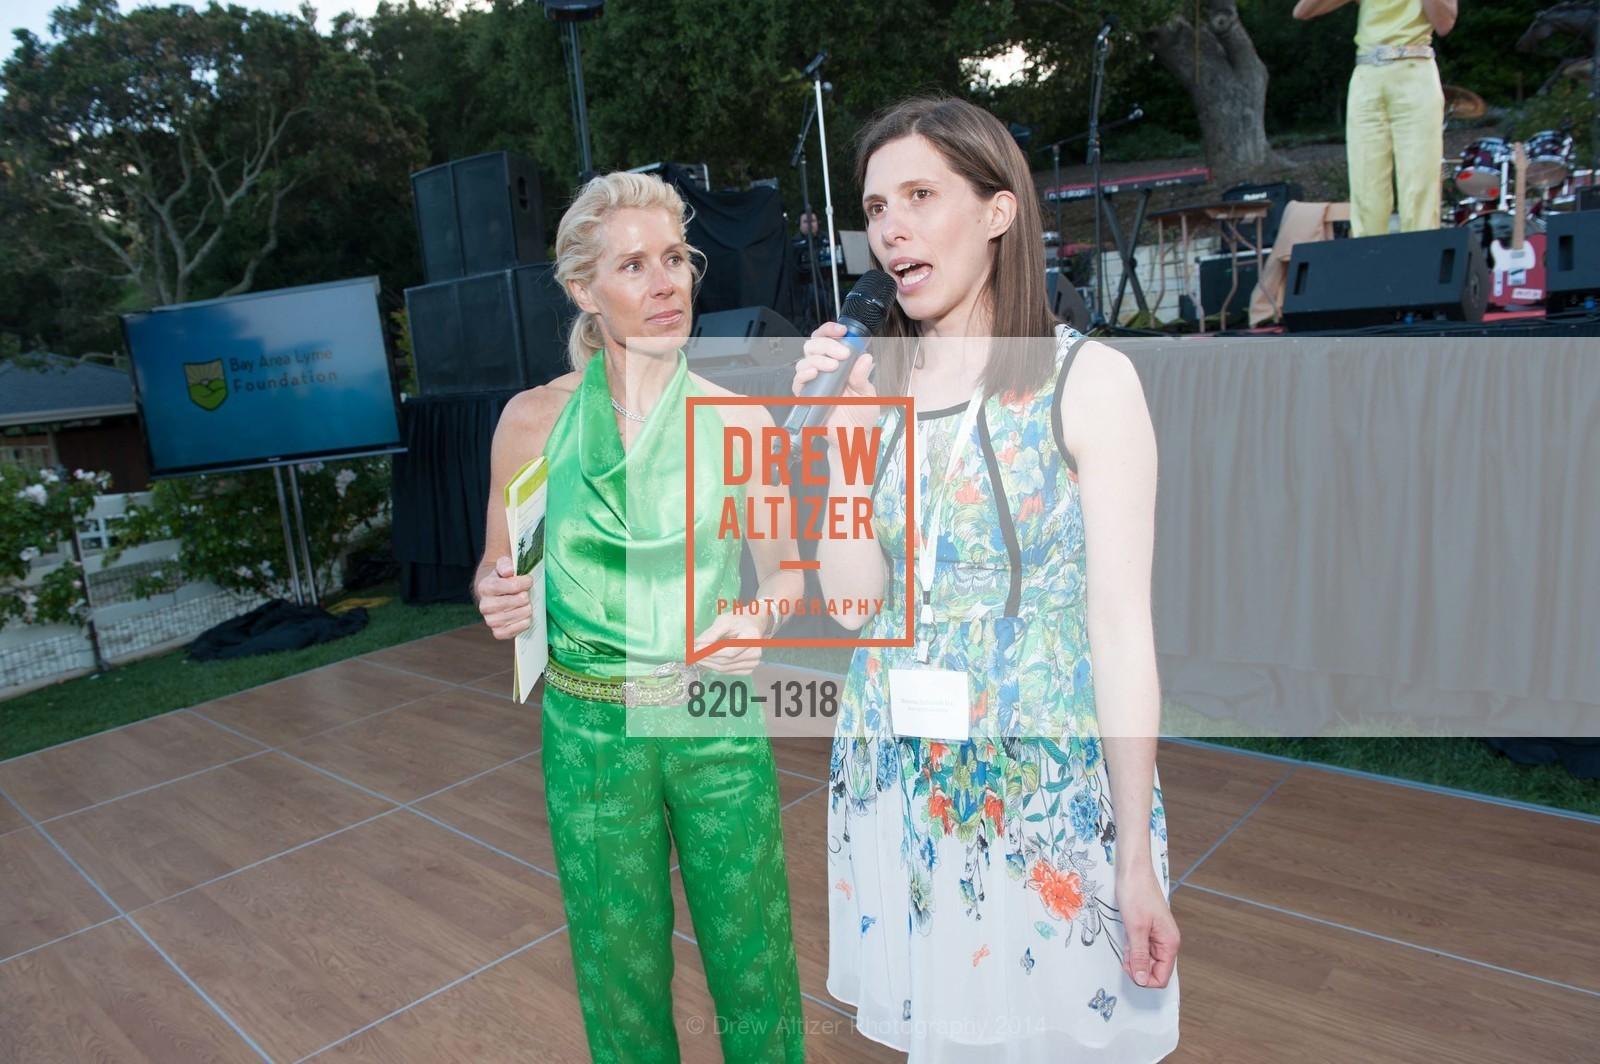 Amy Smith, Nevena Zubcevik, Bay Area Lyme Foundation's LymeAid 2014, 884 Portola Road, Suite A7. Portola Valley, CA 94028, April 27th, 2014